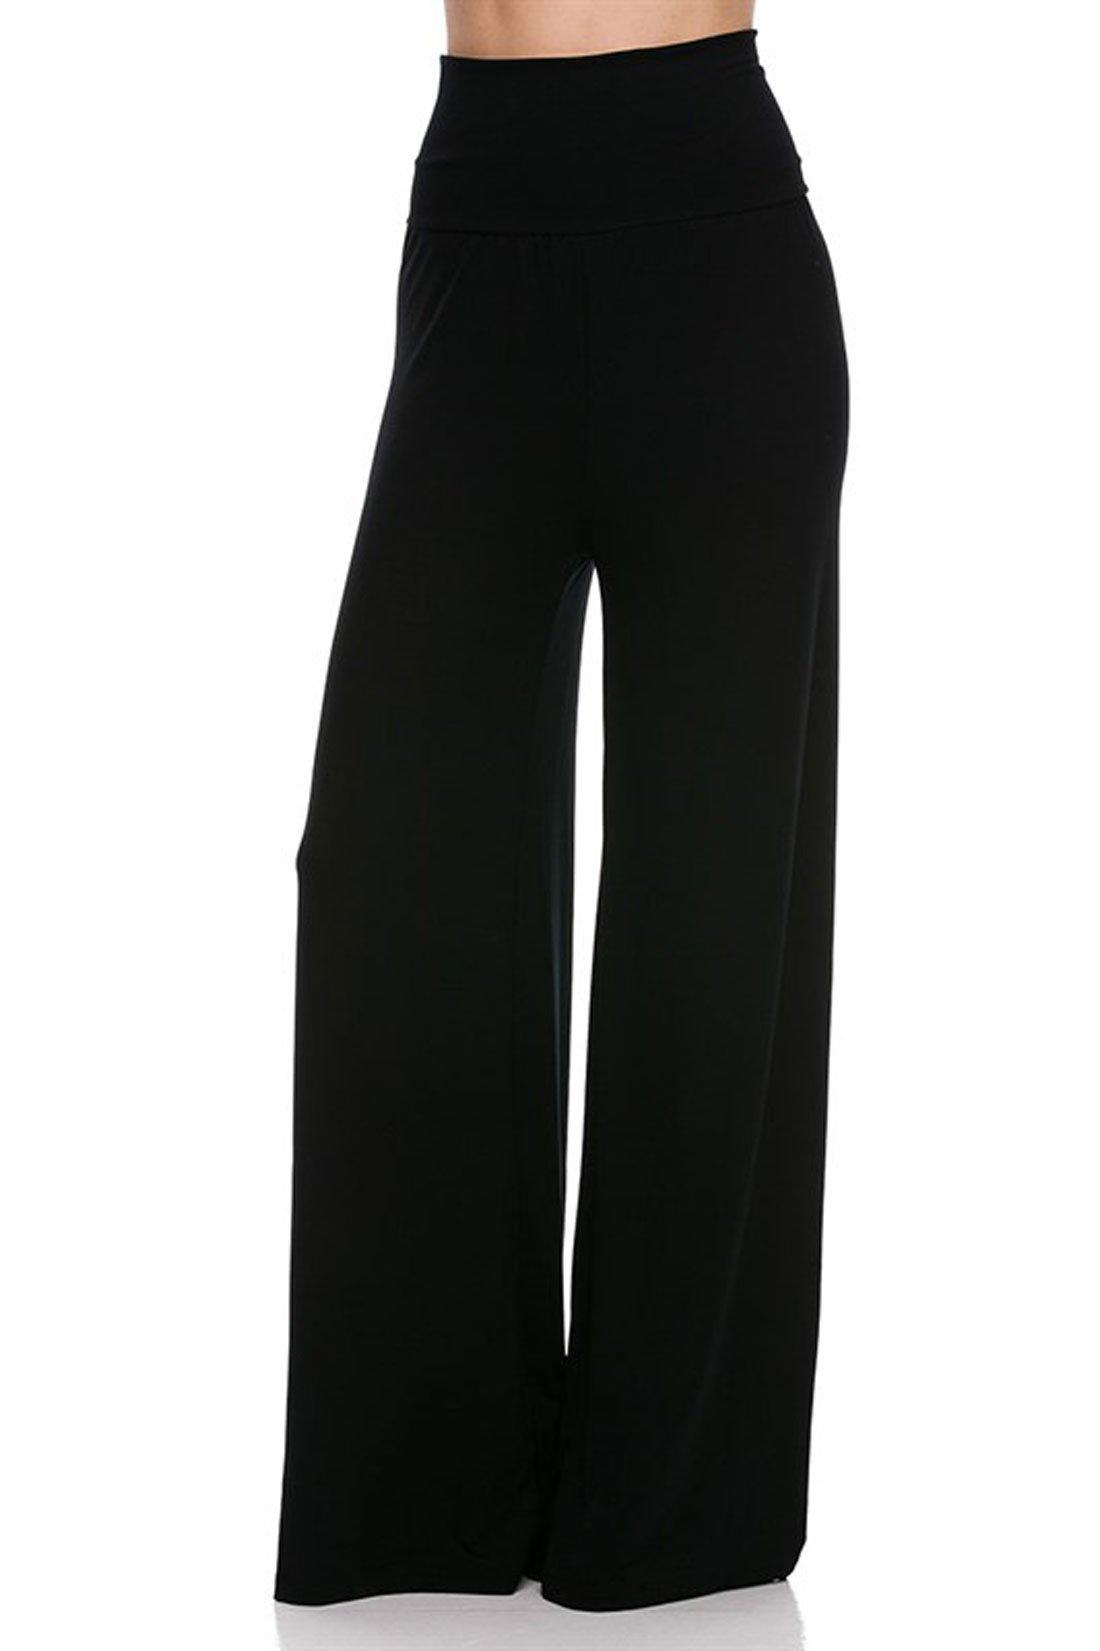 Women's High Waist Slinky Stretchy Palazzo Pants Small Black Modal